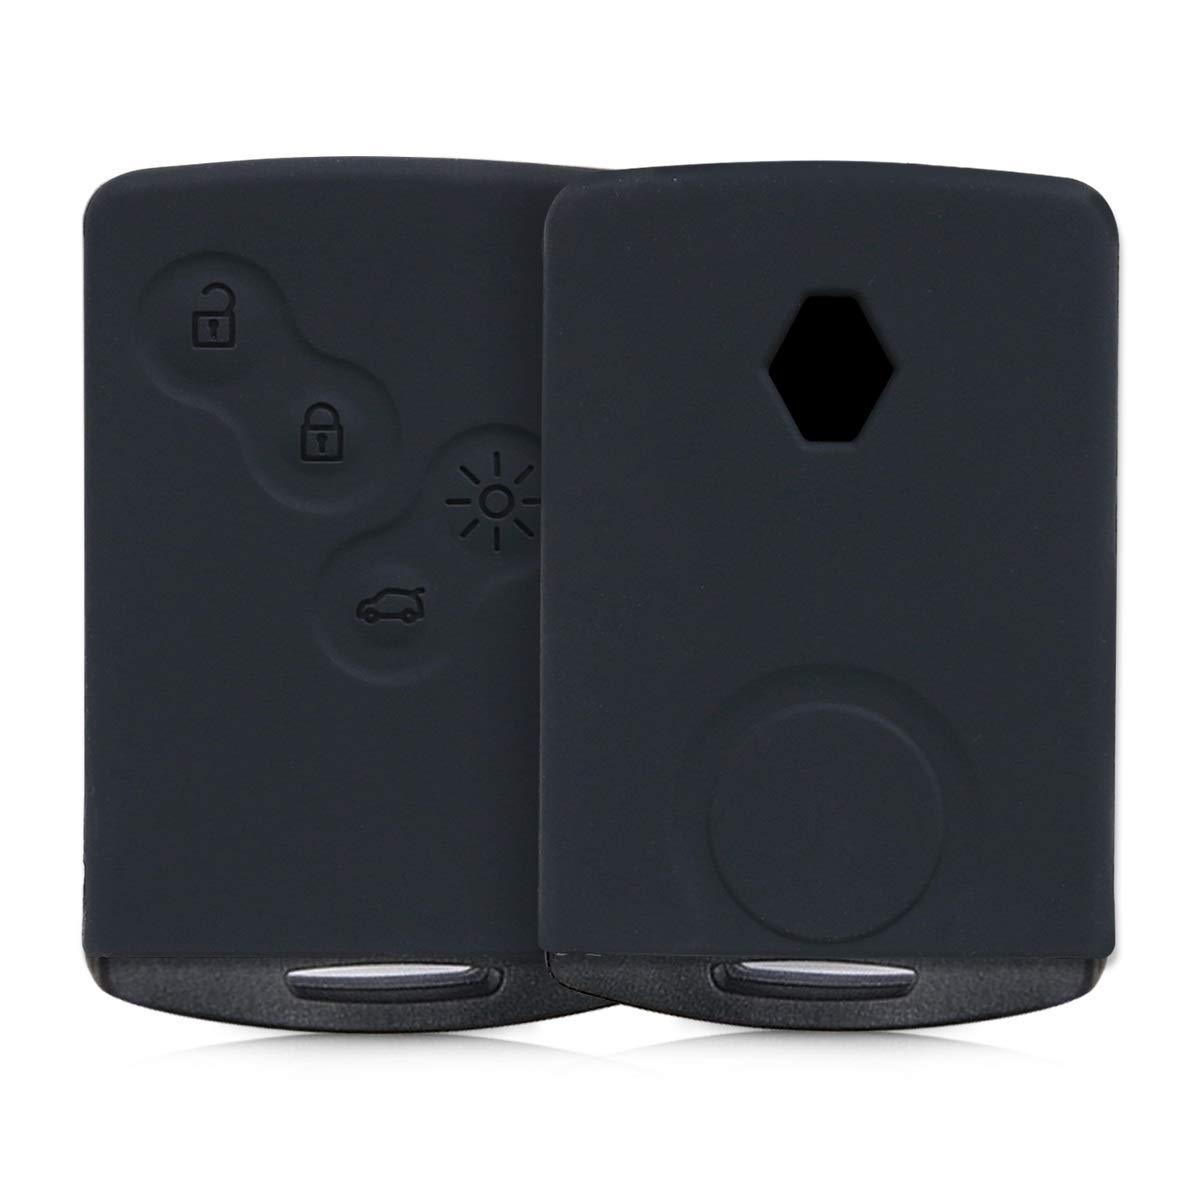 kwmobile Funda de Silicona para Llave de 4 Botones para Coche Renault (Solamente Keyless Go) - Carcasa Protectora [Suave] de [Silicona] - Case Mando de Auto [Azul] KW-Commerce 44704.04_m000691